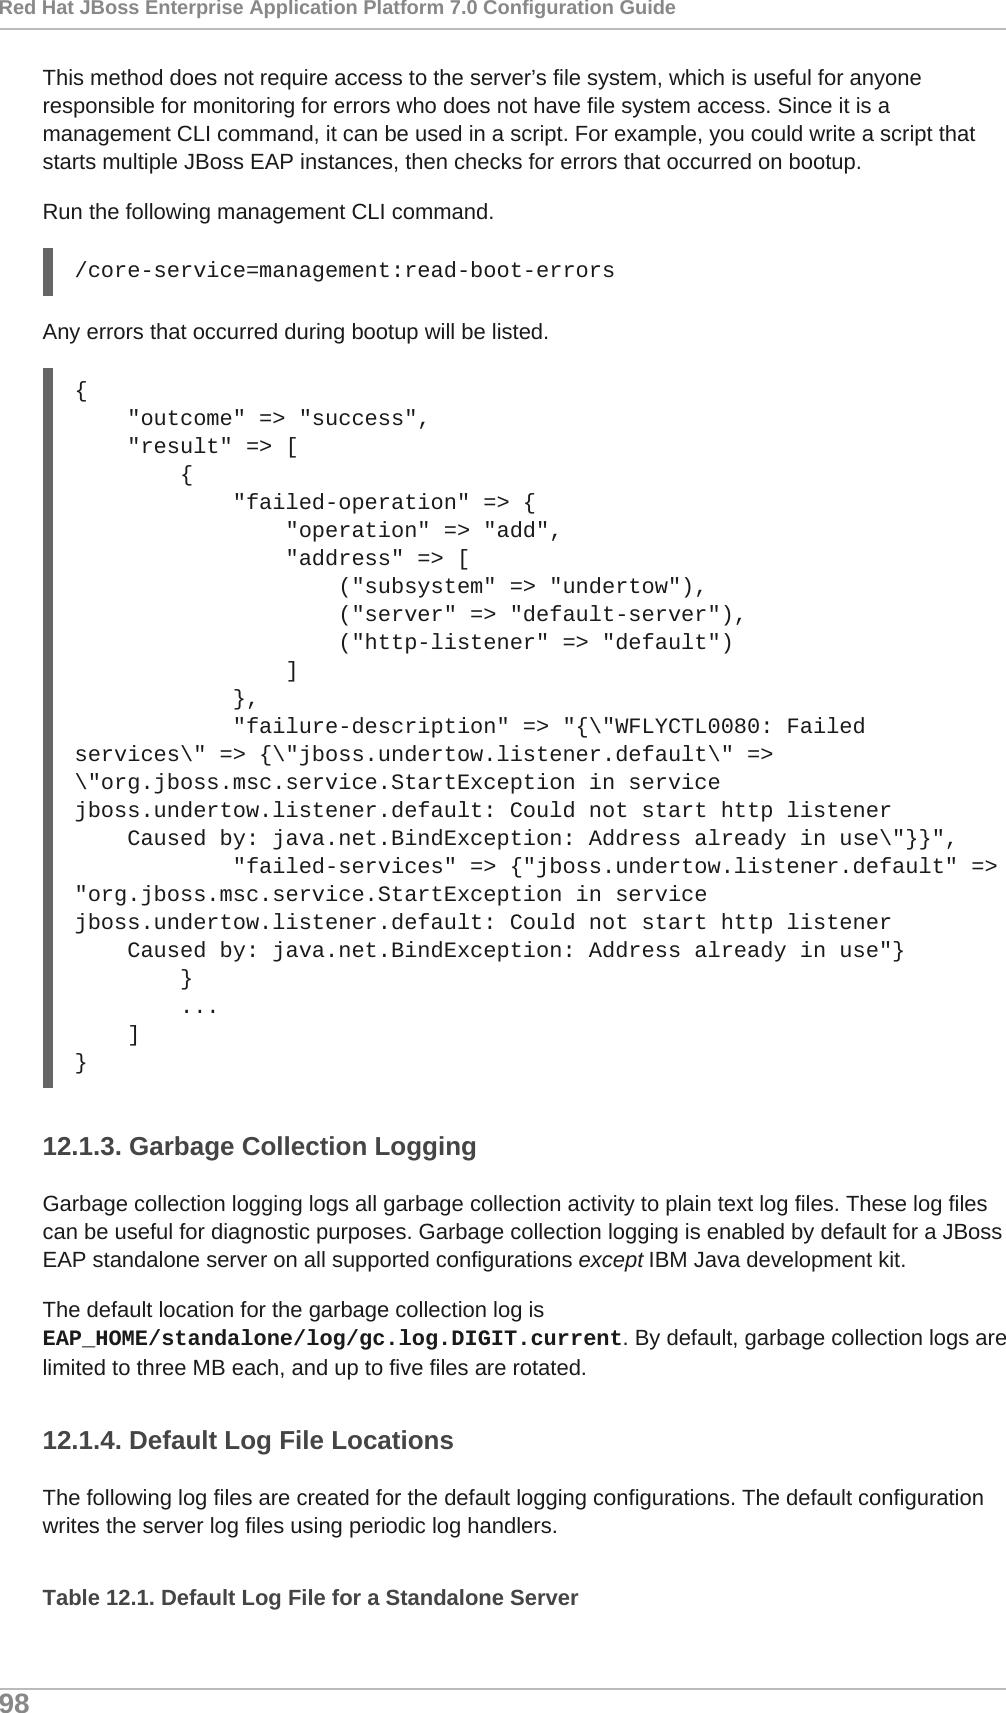 Red Hat JBoss Enterprise Application Platform 7 0 Configuration